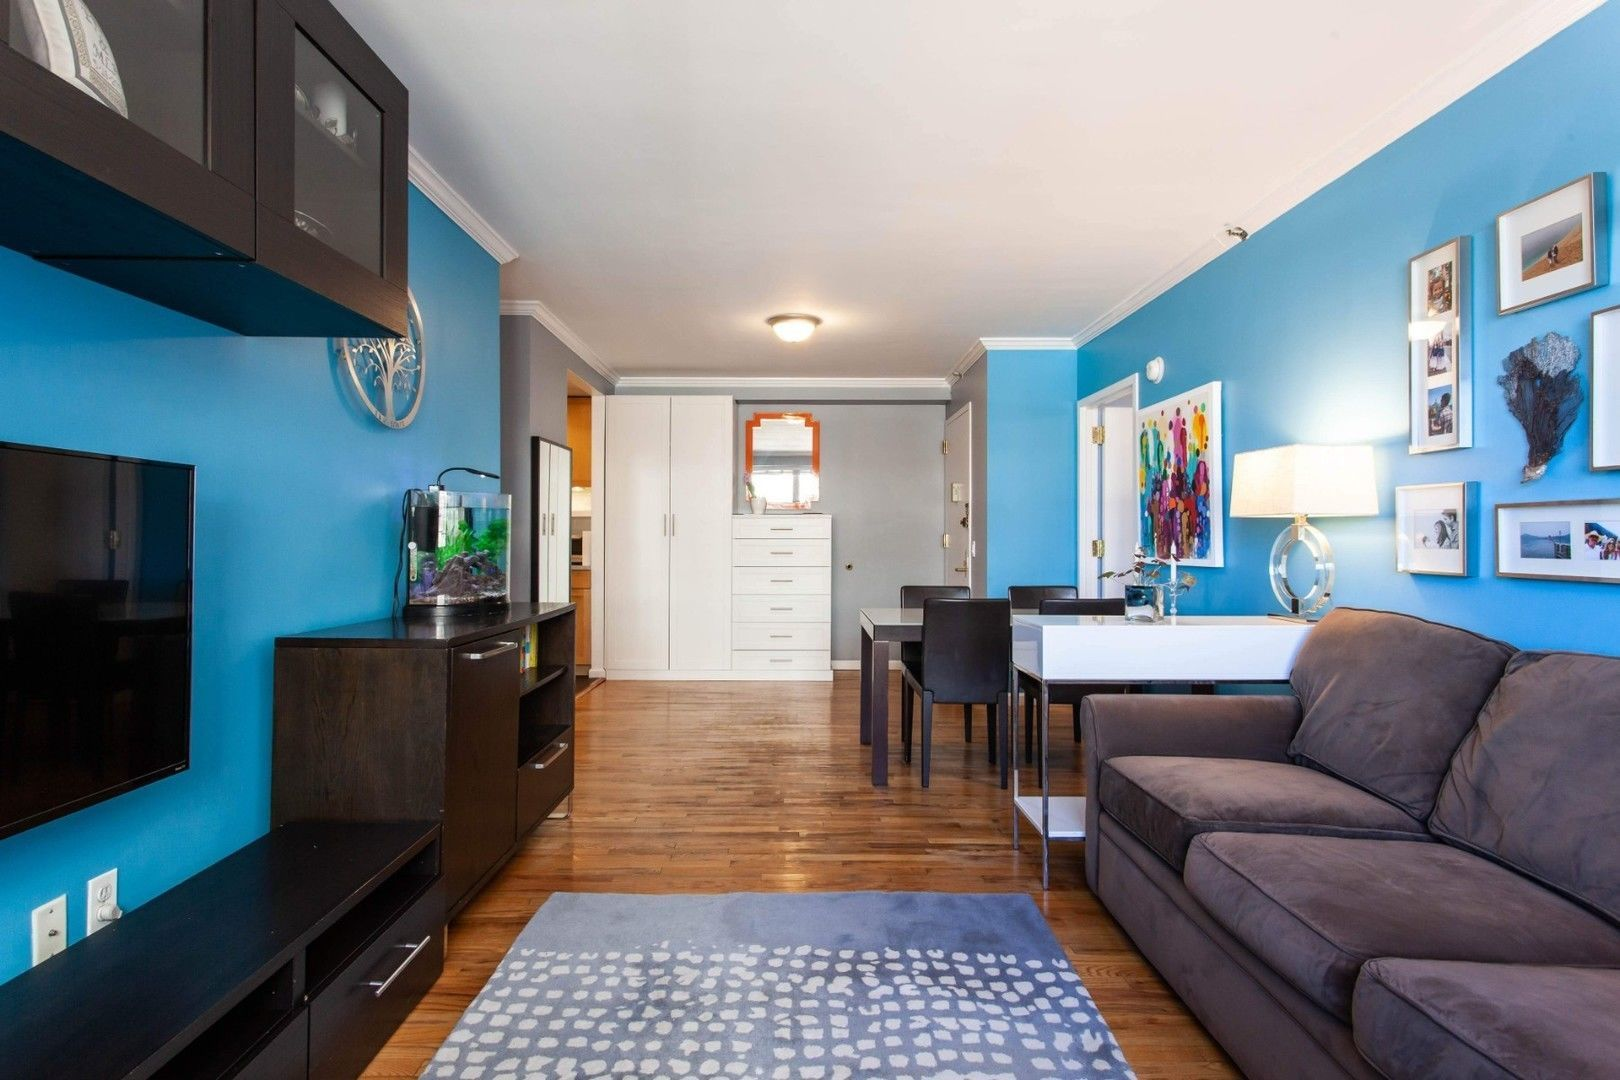 Apartment for sale at 1831 Madison Avenue, Apt 7M